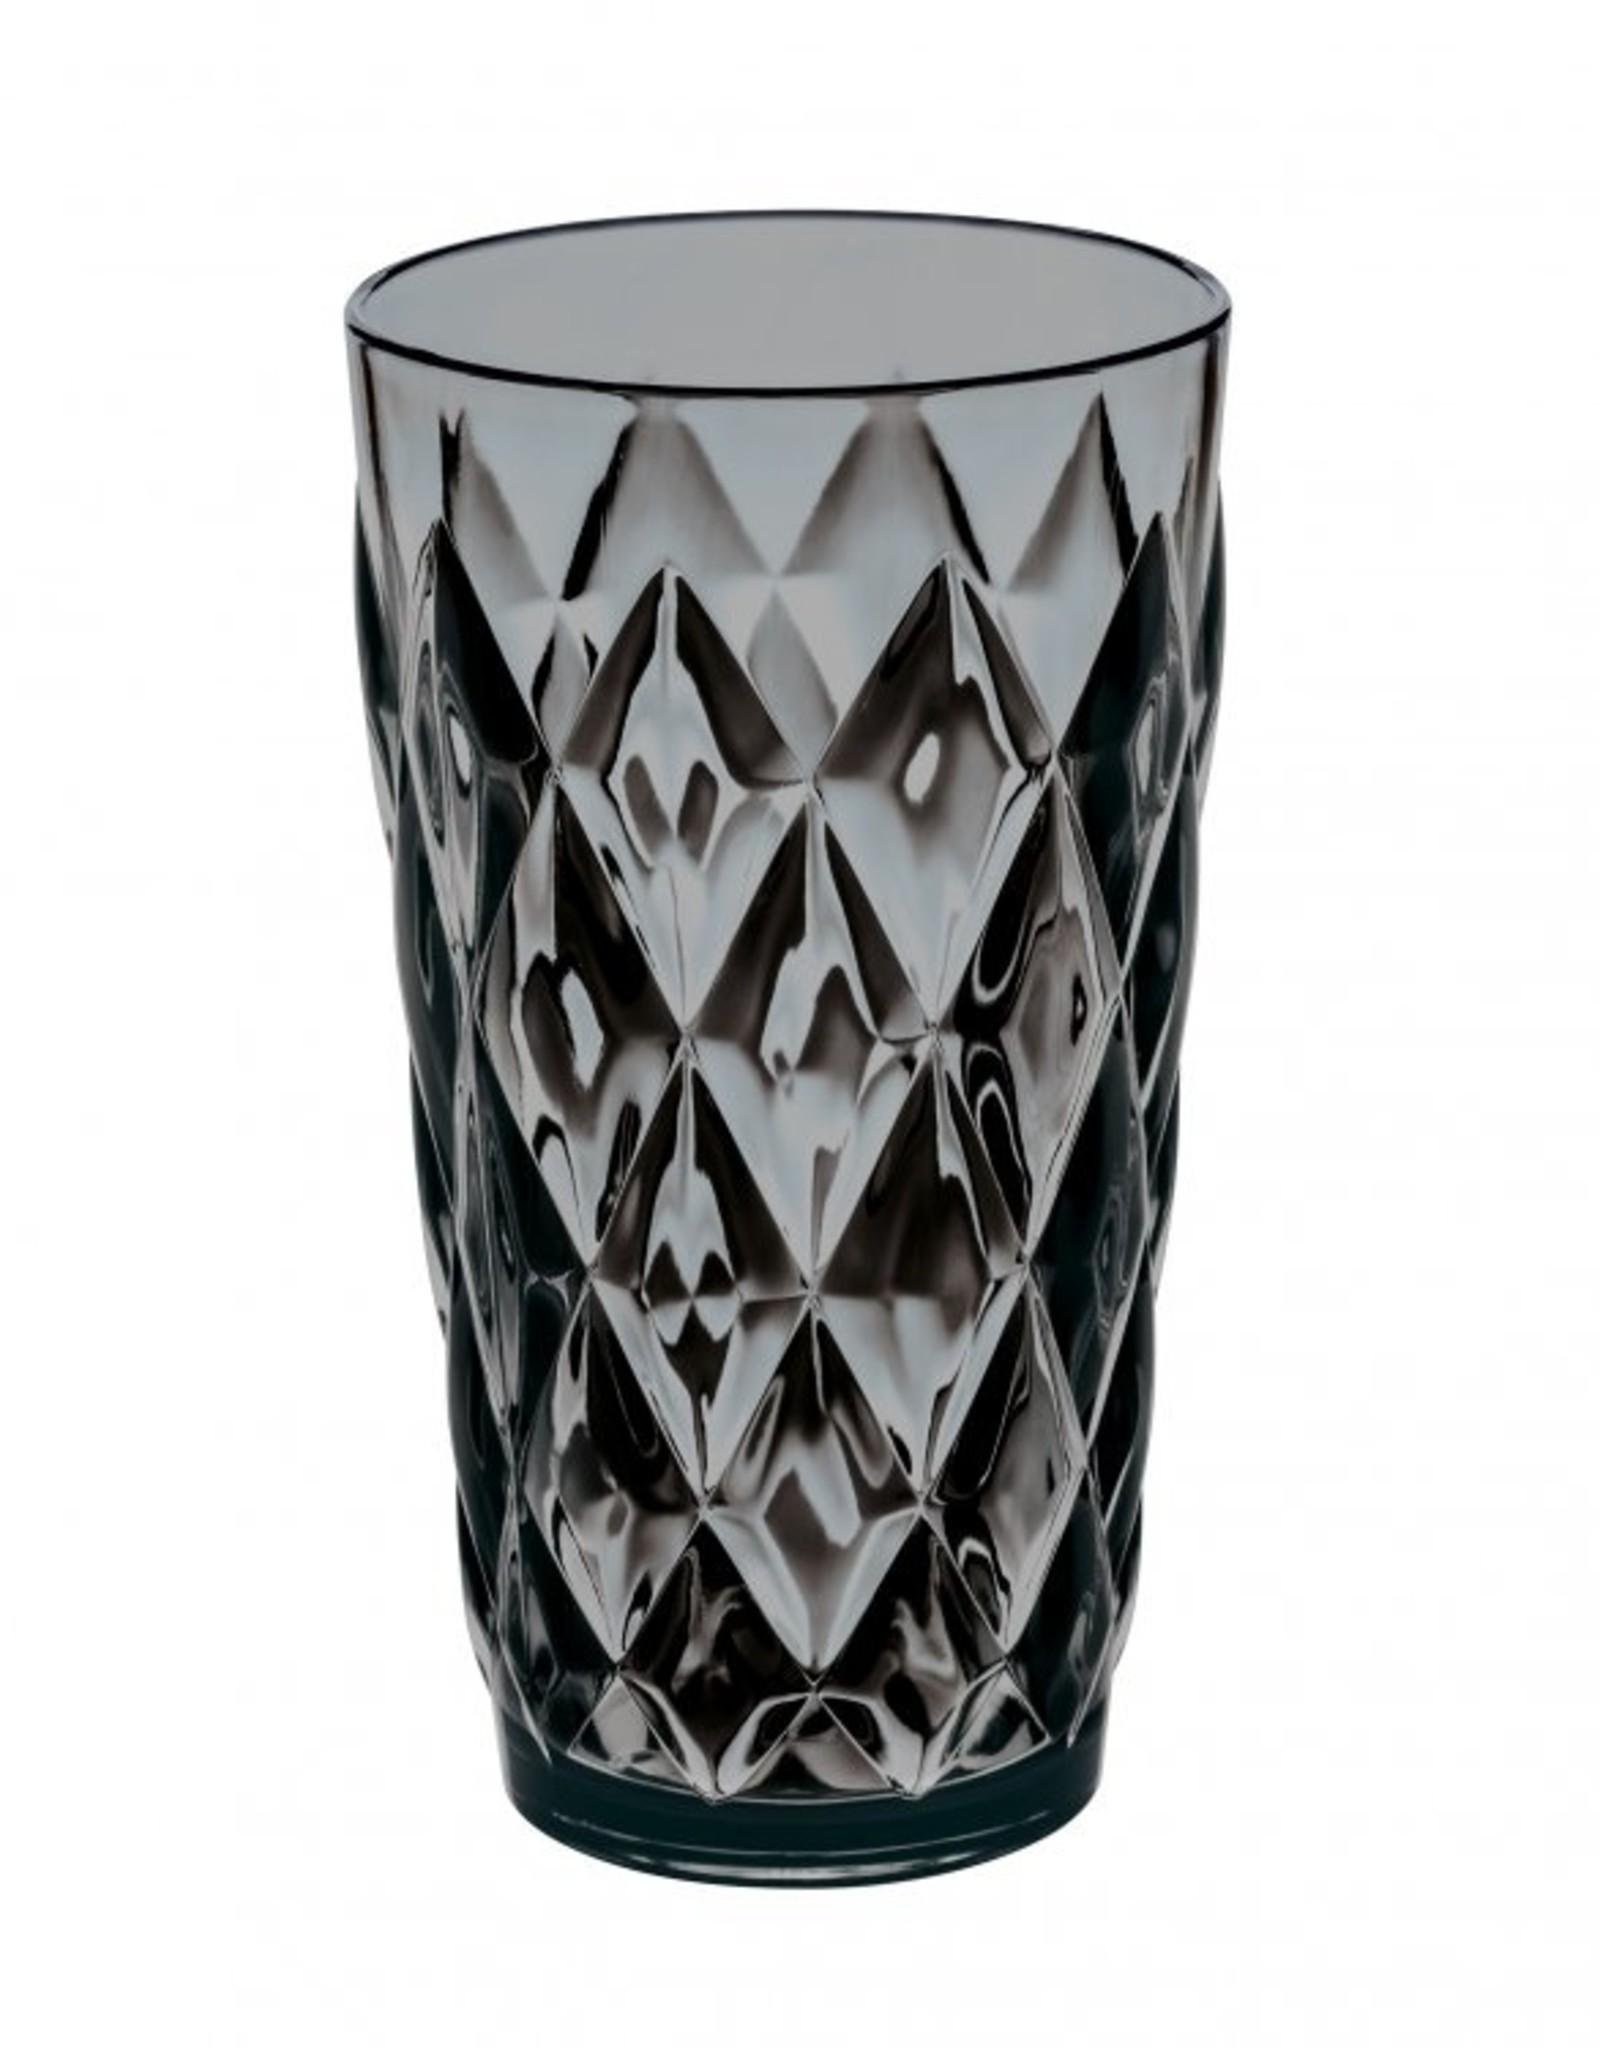 Koziol Koziol - Crystal L - Drinkglas - 450ml - transparant grijs - set van 6